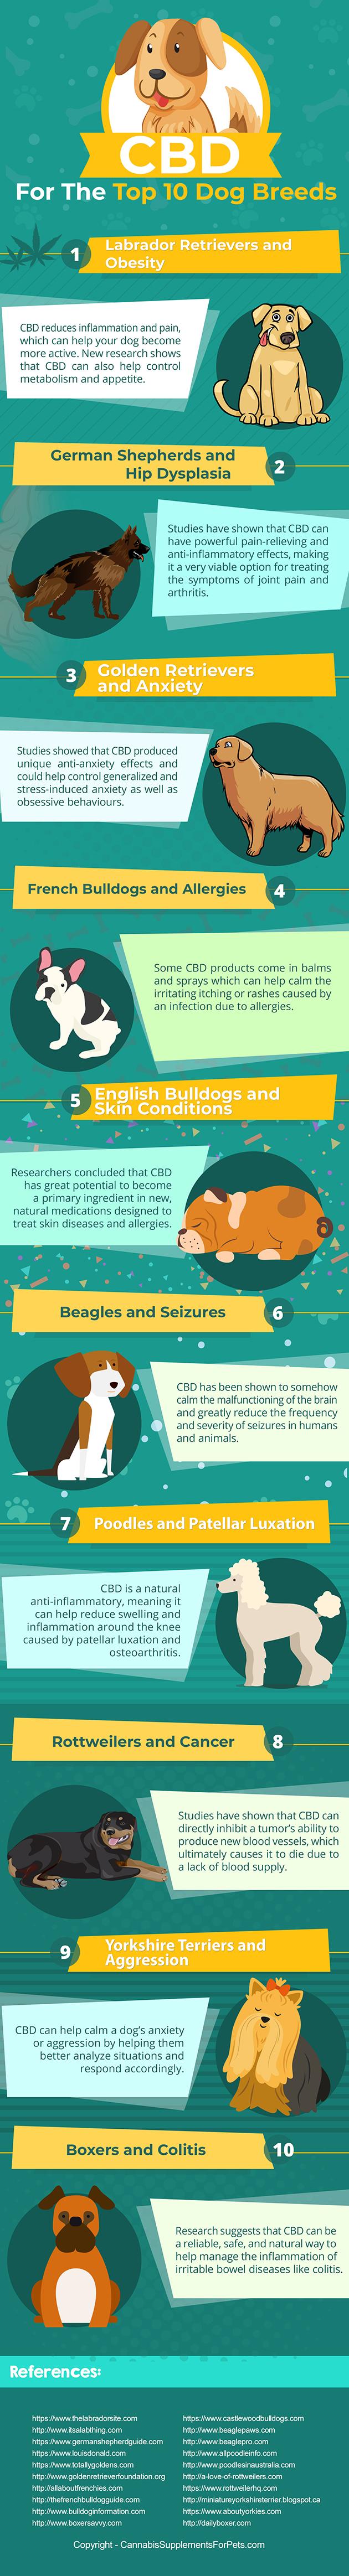 Infographic on CBD for dog breeds